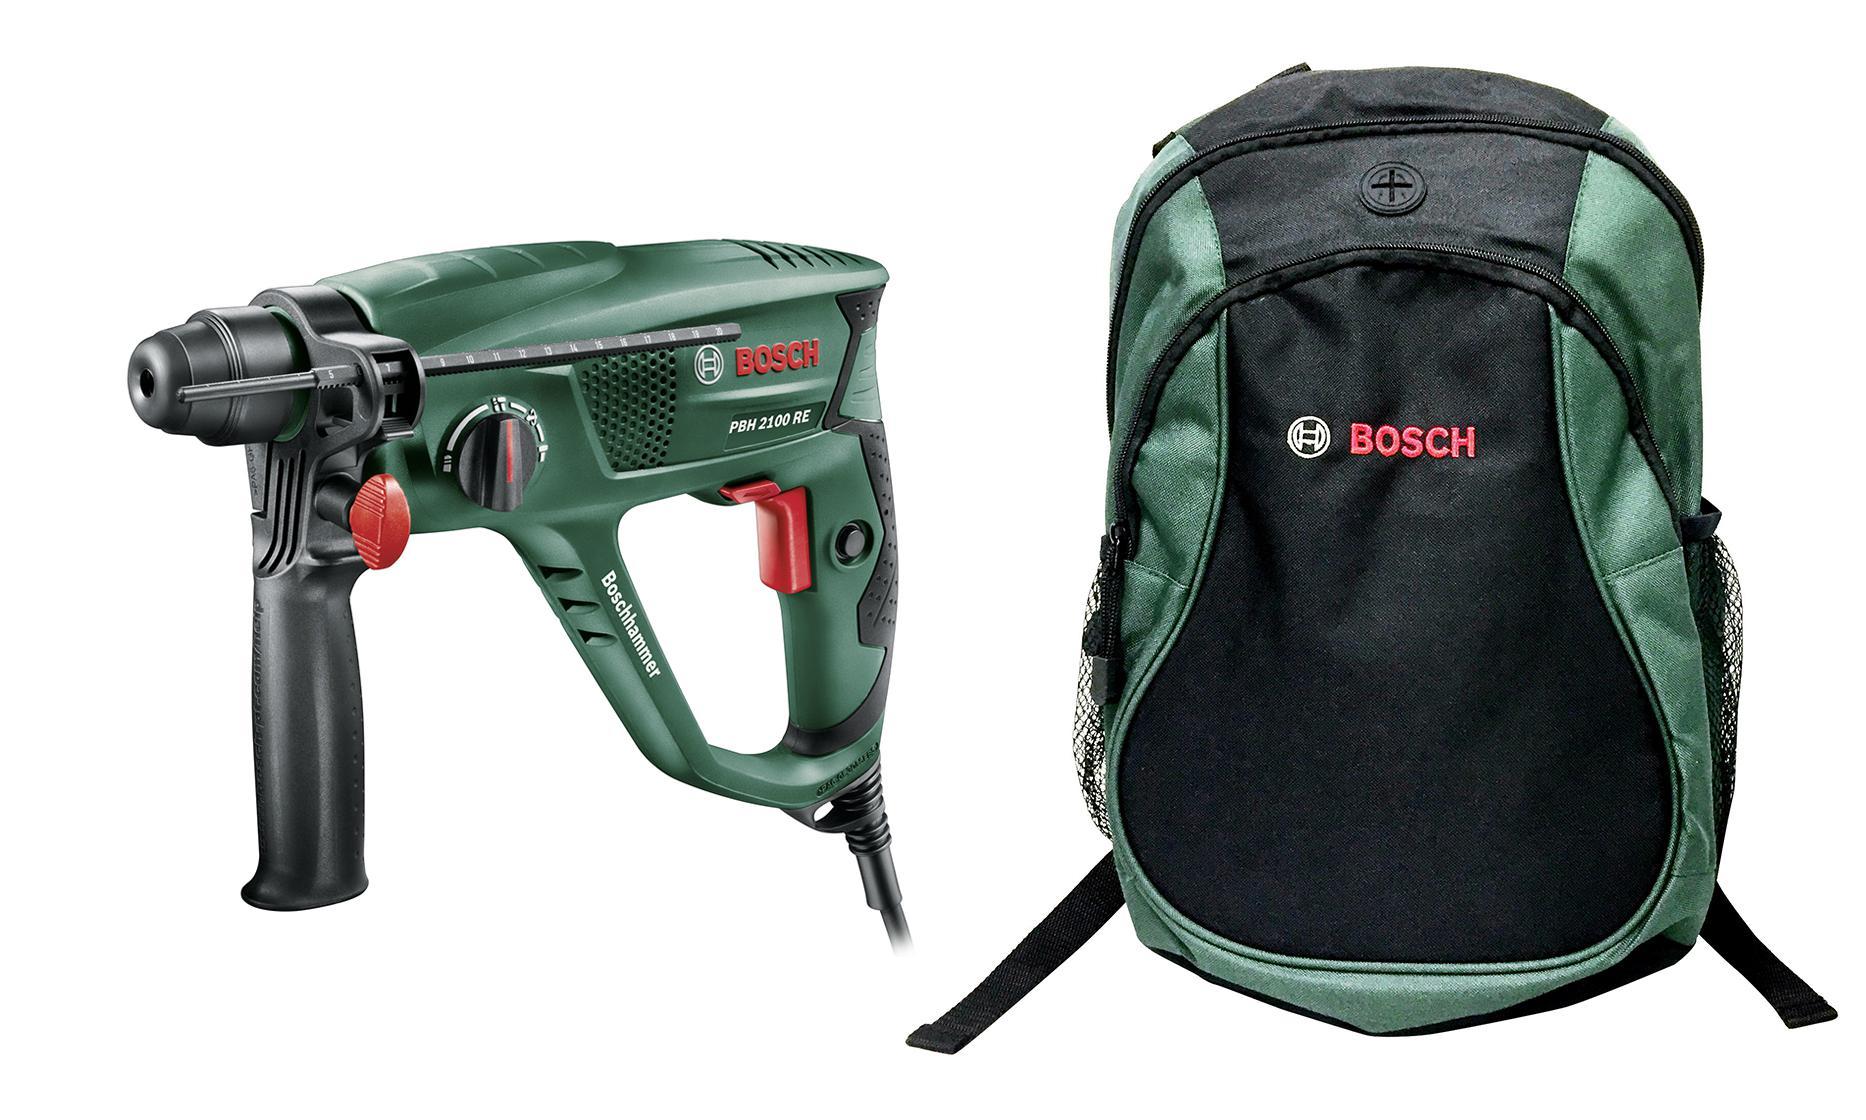 Набор Bosch Перфоратор pbh 2100 re (0.603.3a9.320) +Рюкзак green (1619g45200) перфоратор sds plus bosch pbh 2500 re 0 603 344 421